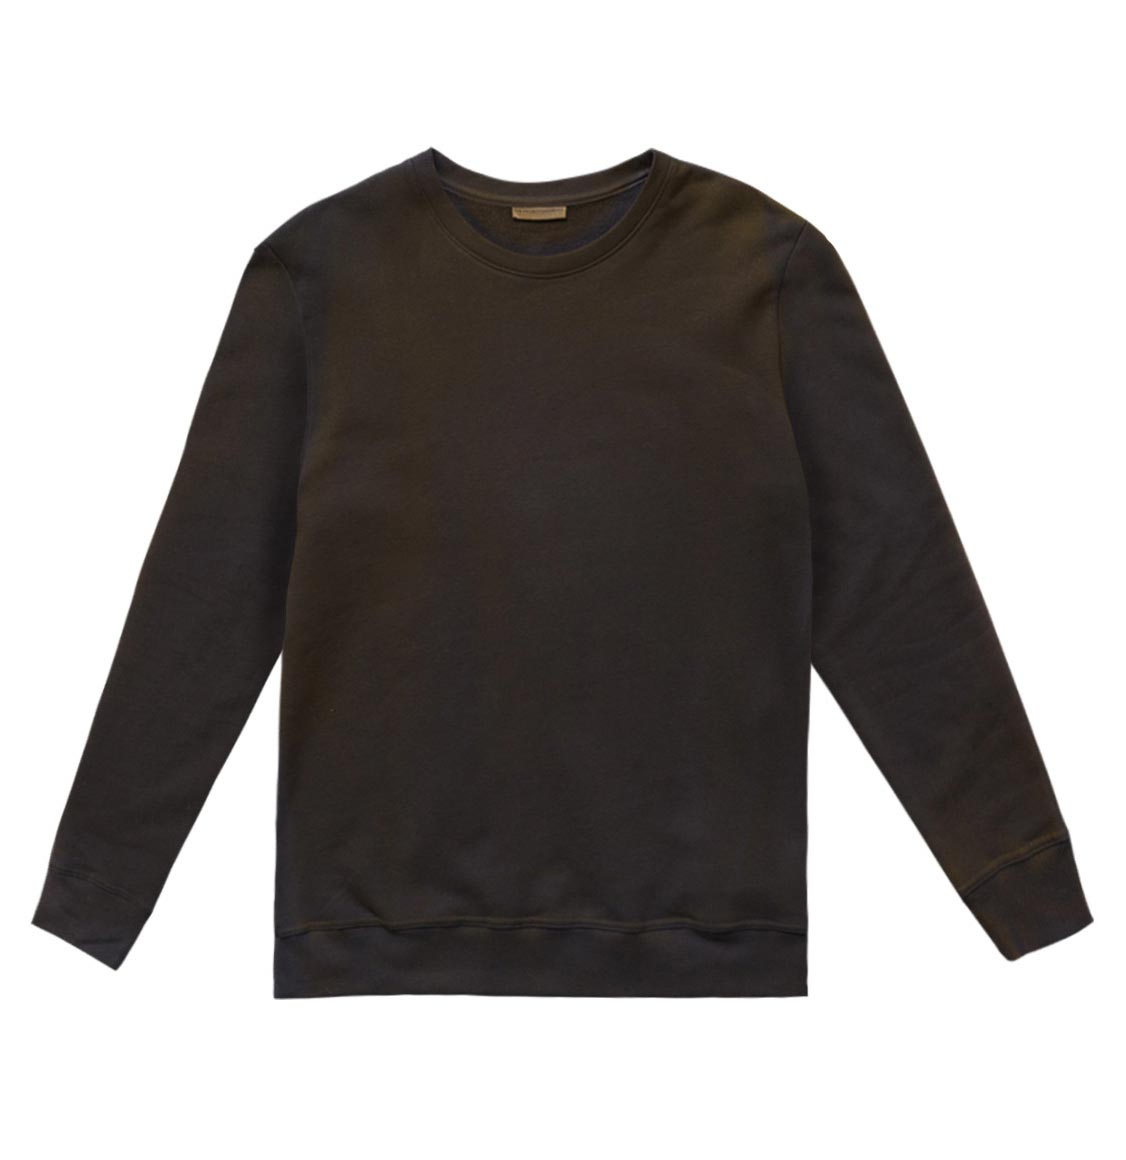 The Project Garments Acid Dye Organic Cotton Crew Neck Sweatshirt Meteorite